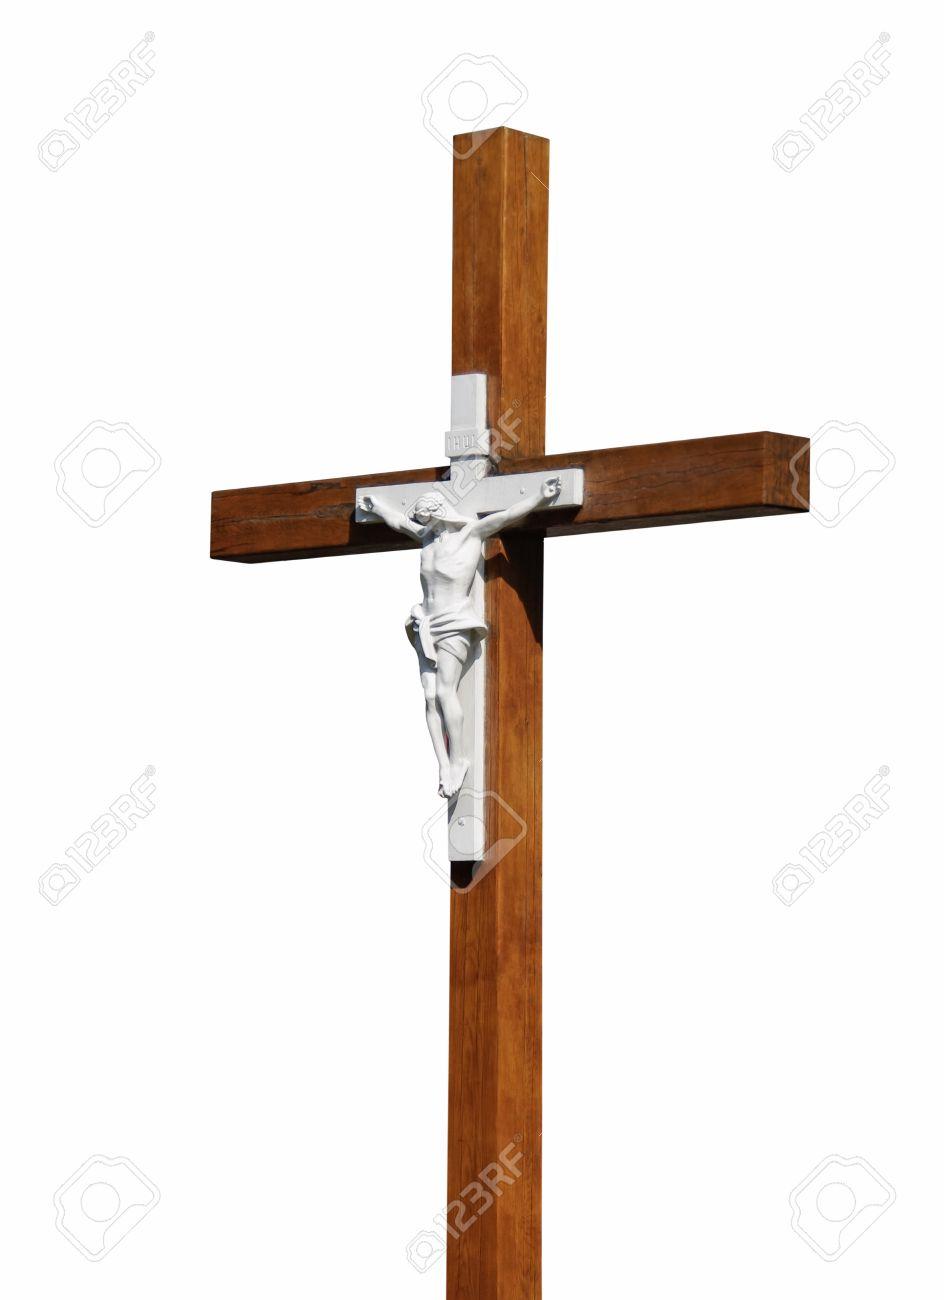 Crucifixion jesus christ on the cross crucifix biblical crucifixion jesus christ on the cross crucifix biblical symbol of christian god biocorpaavc